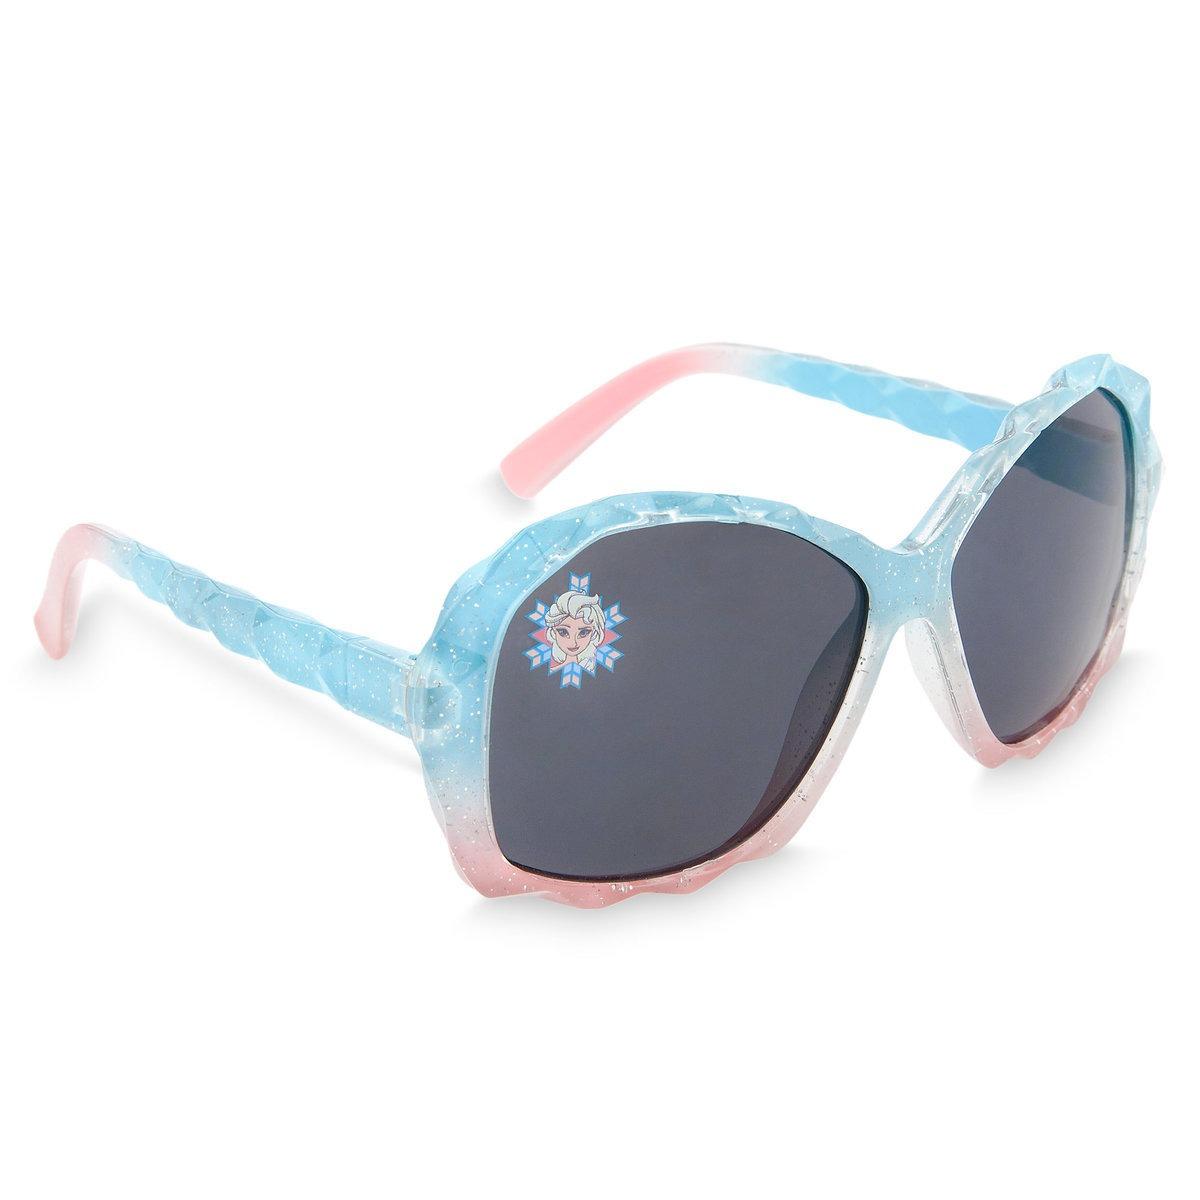 e87fa5714b078 Óculos De Sol Infantil Frozen Disney Store - R  59,90 em Mercado Livre